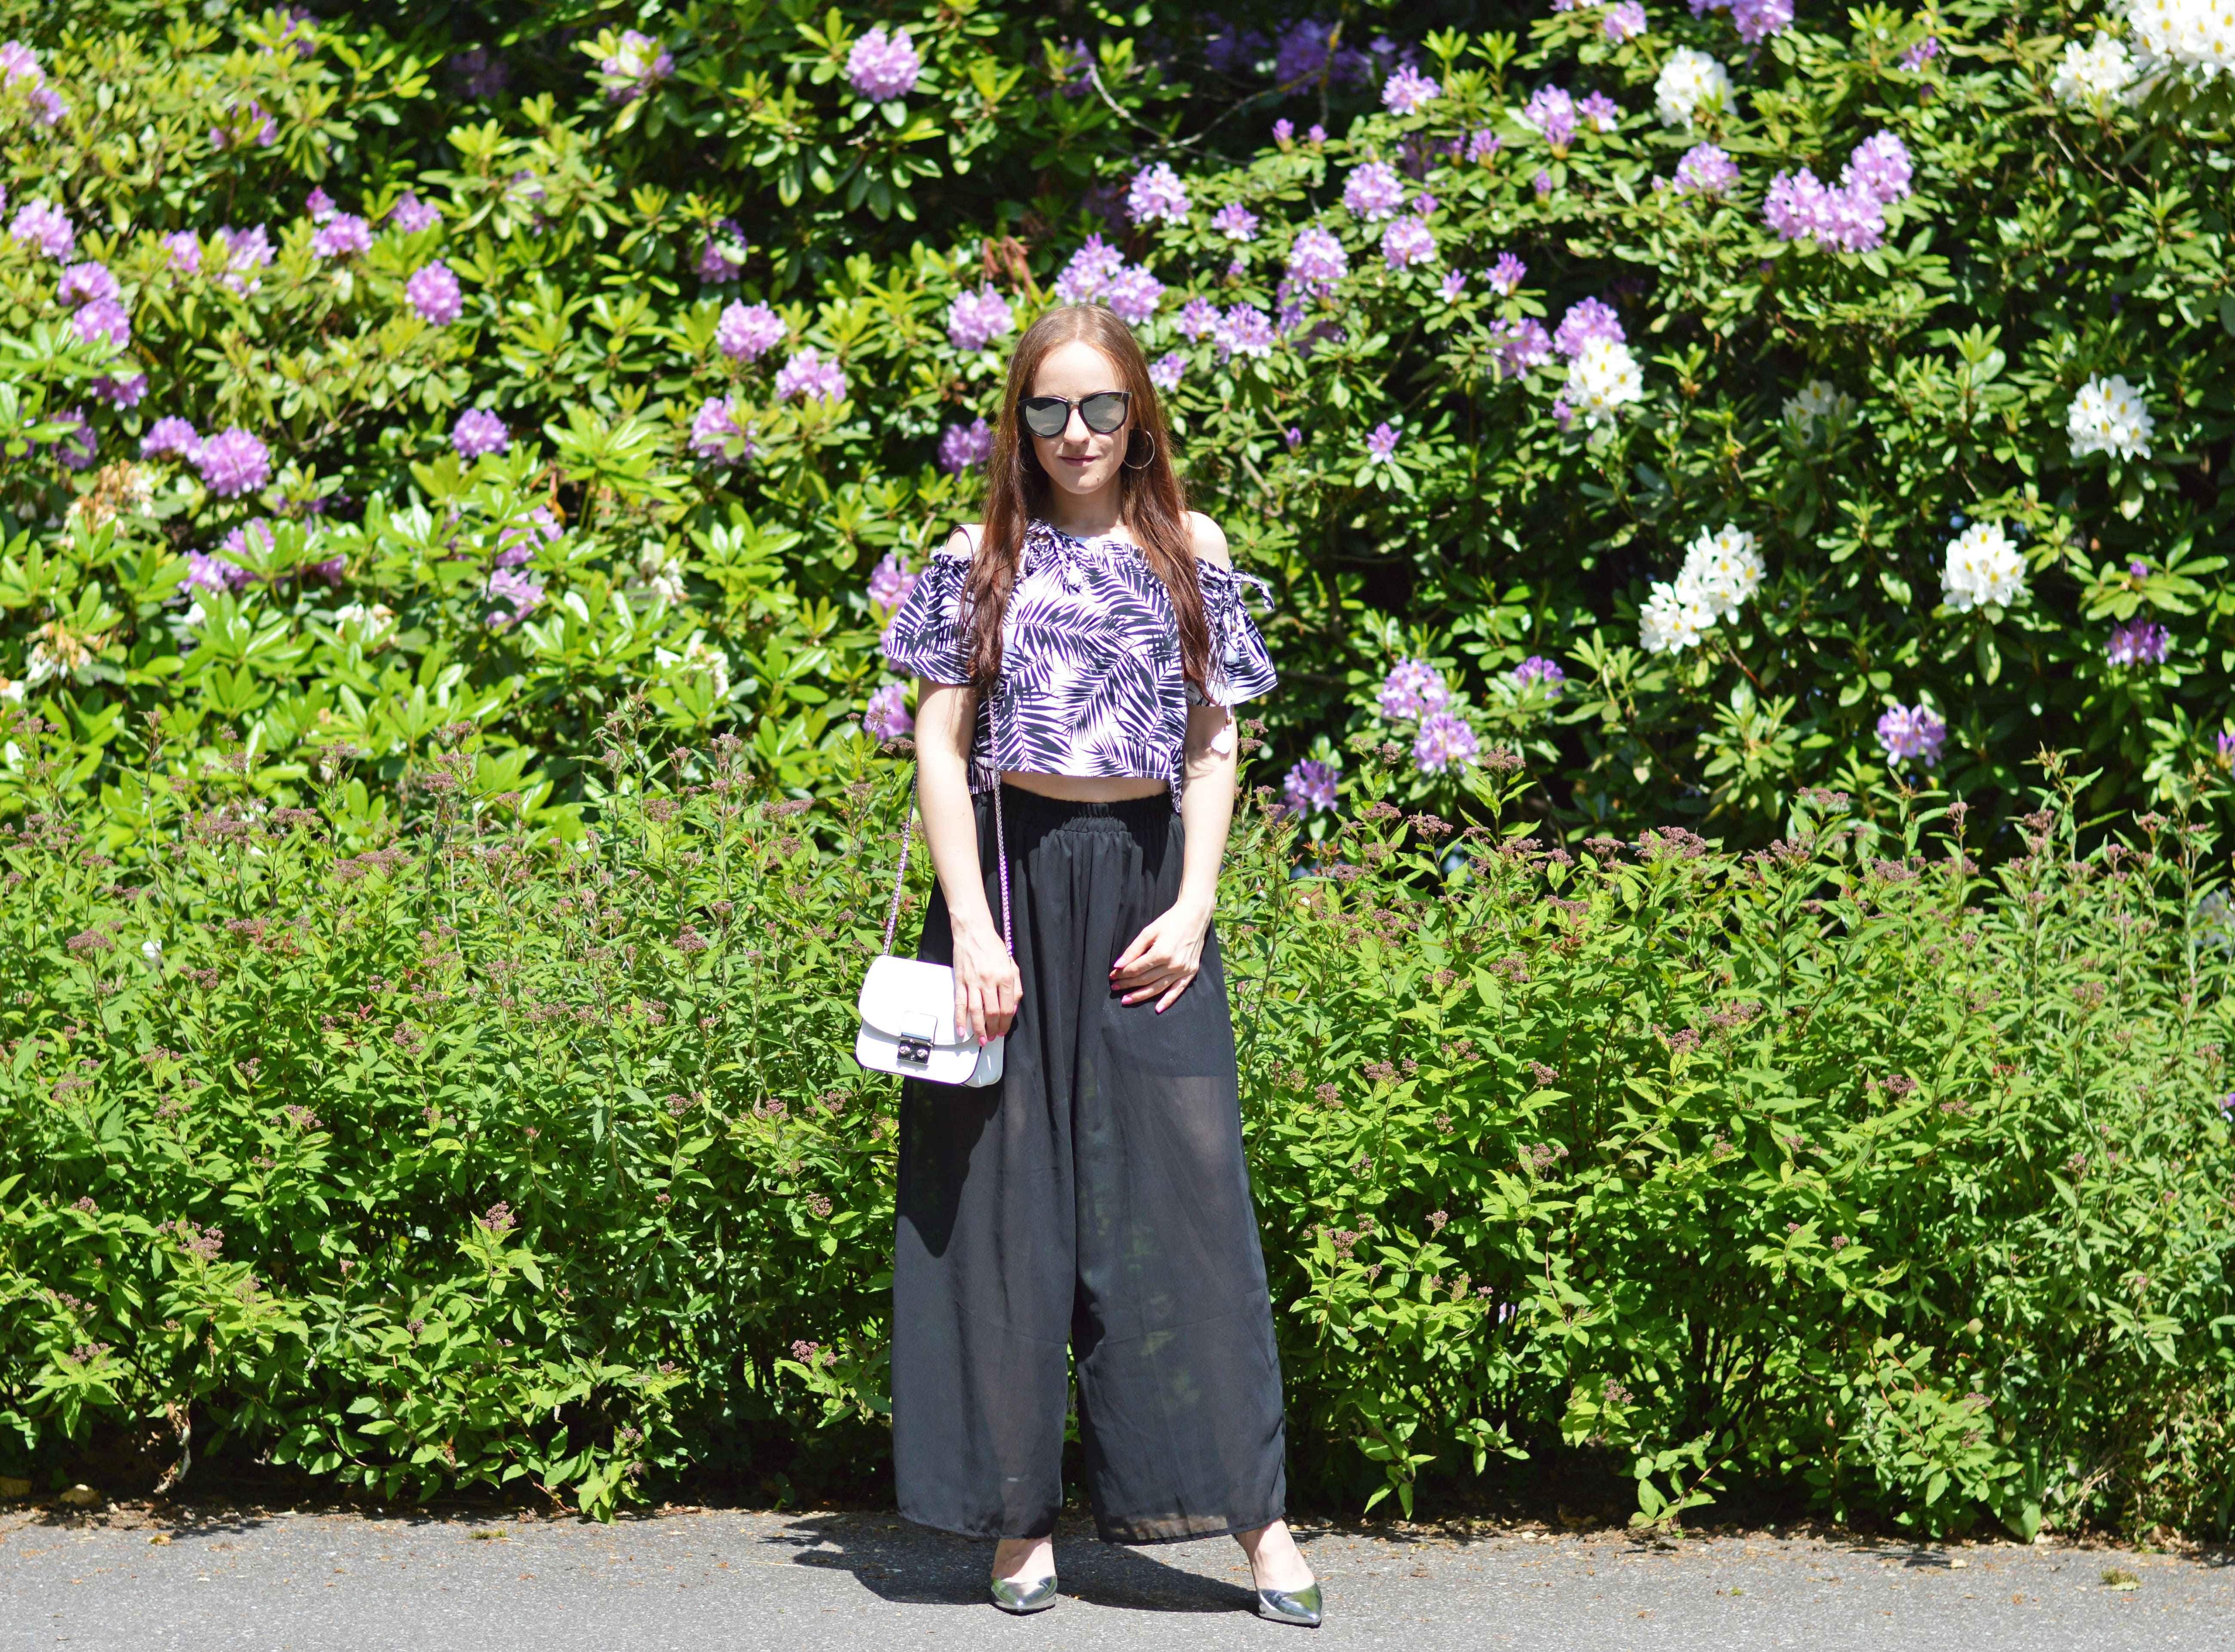 Fashion summer look